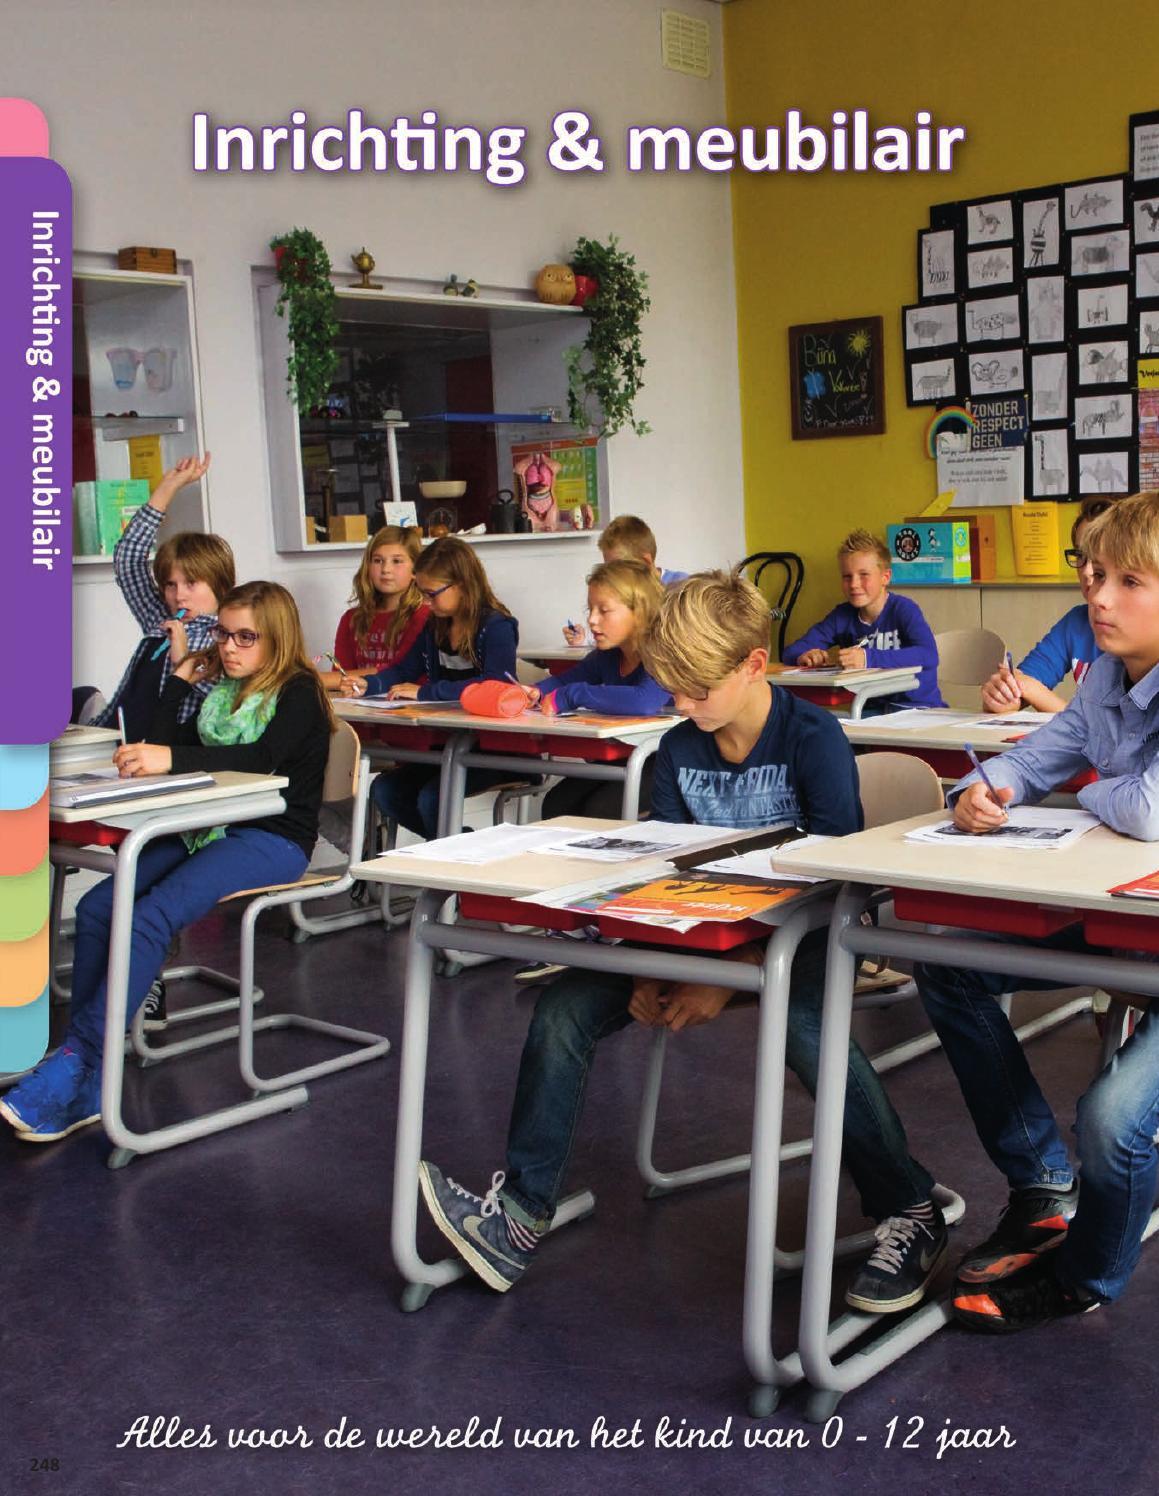 Issuu kg rolf catalogus basisonderwijs inrichting for Meubilair basisonderwijs